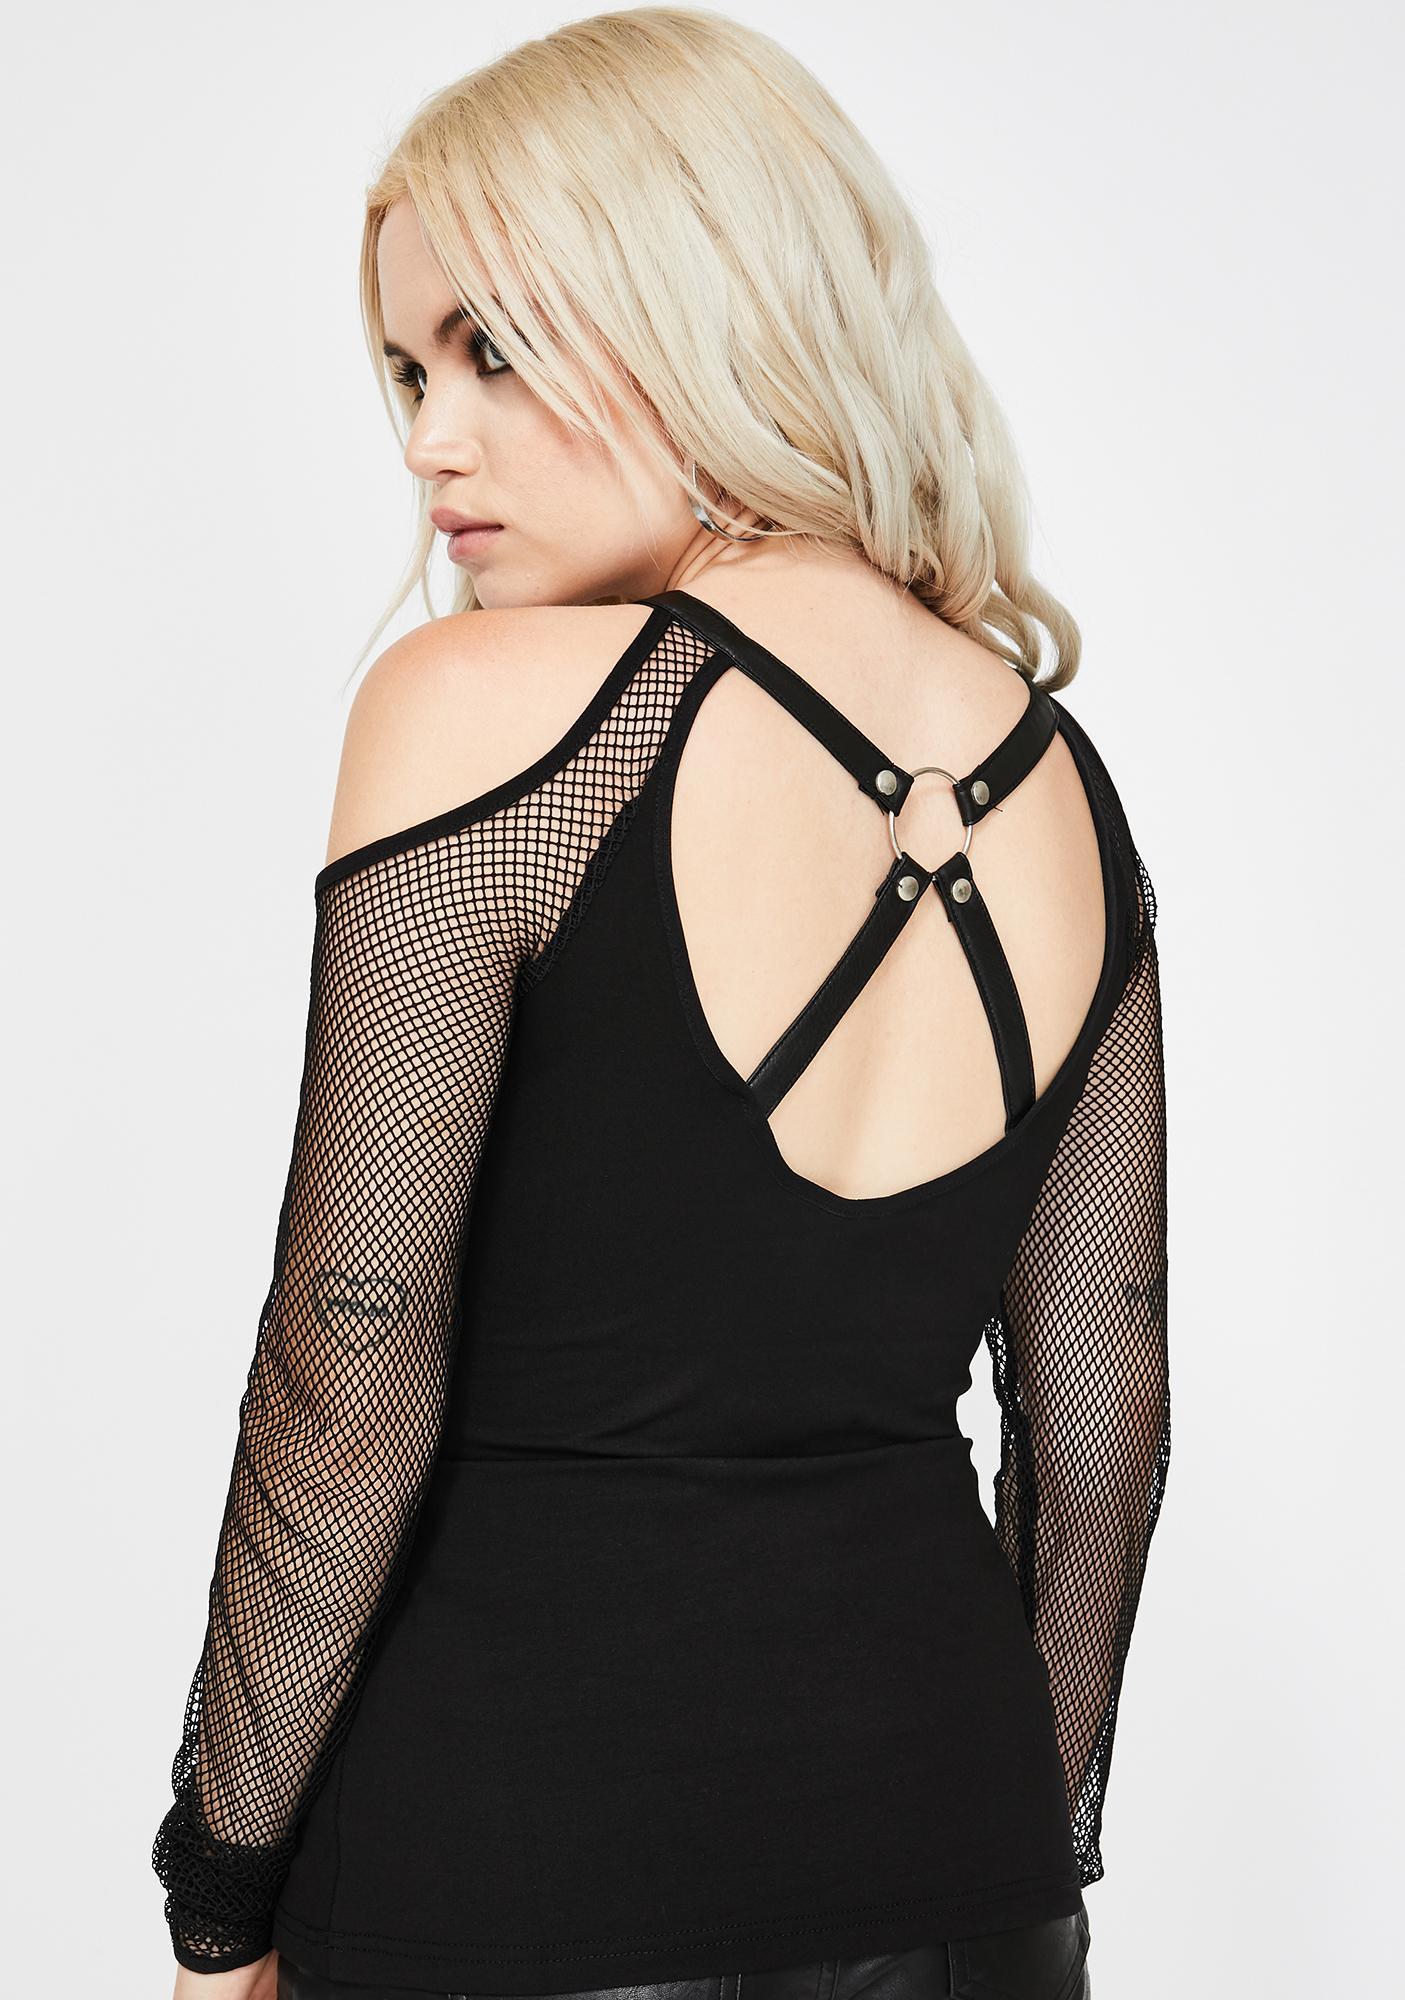 Devil Fashion Fishnet Sleeve Lace-Up Cut-Out Top